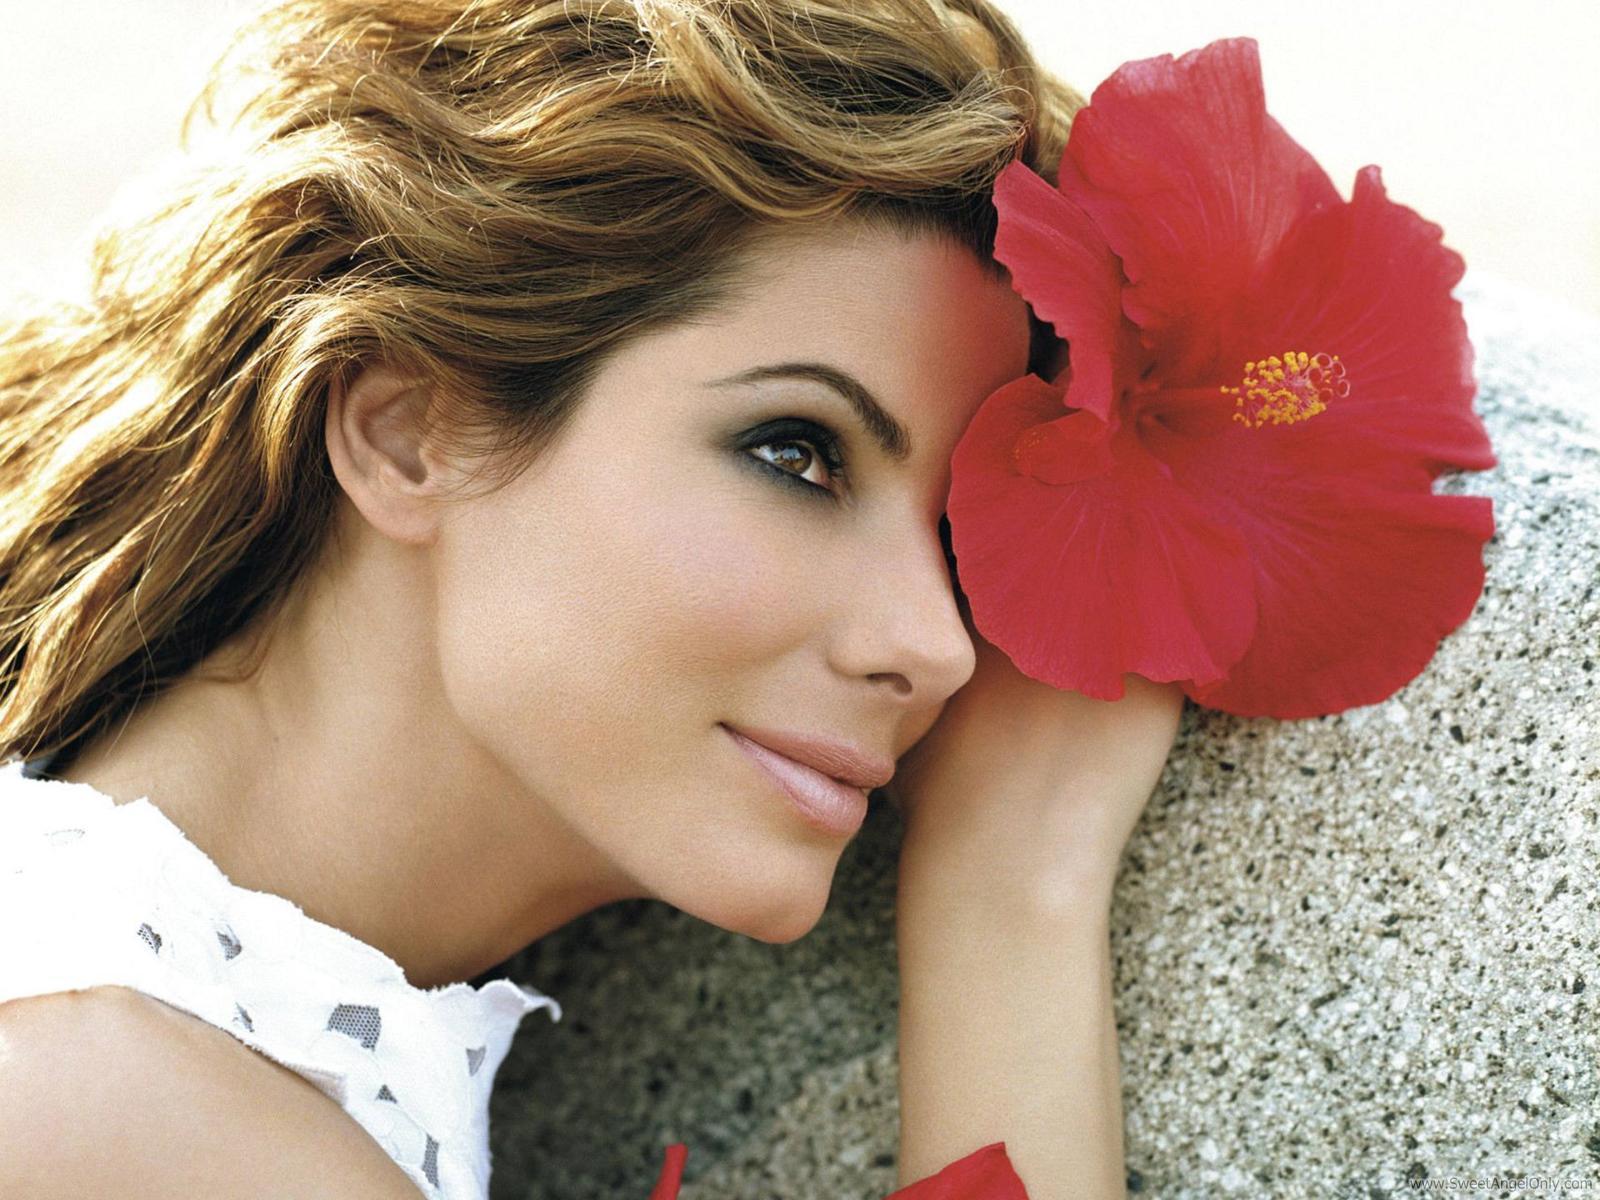 http://2.bp.blogspot.com/-qluMsCmdDkI/Tt3mLfcdE1I/AAAAAAAACMs/wzPa_m5Fudo/s1600/sandra_bullock_actress_wallpaper_03-1600x1200.jpg